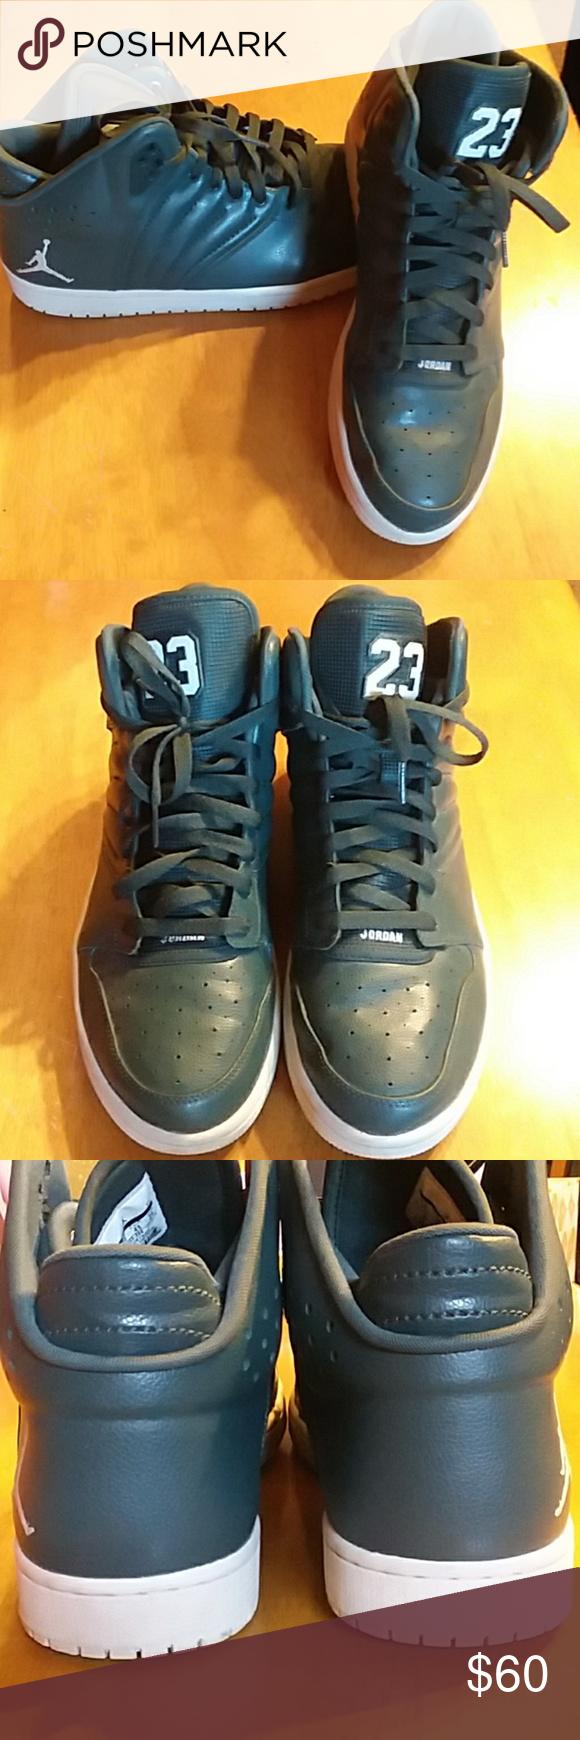 b0cc290b169 Mens Dark Green Jordans Like new Worn handful of times Dark green 23  Jordan s Size 11 Nike Shoes Athletic Shoes